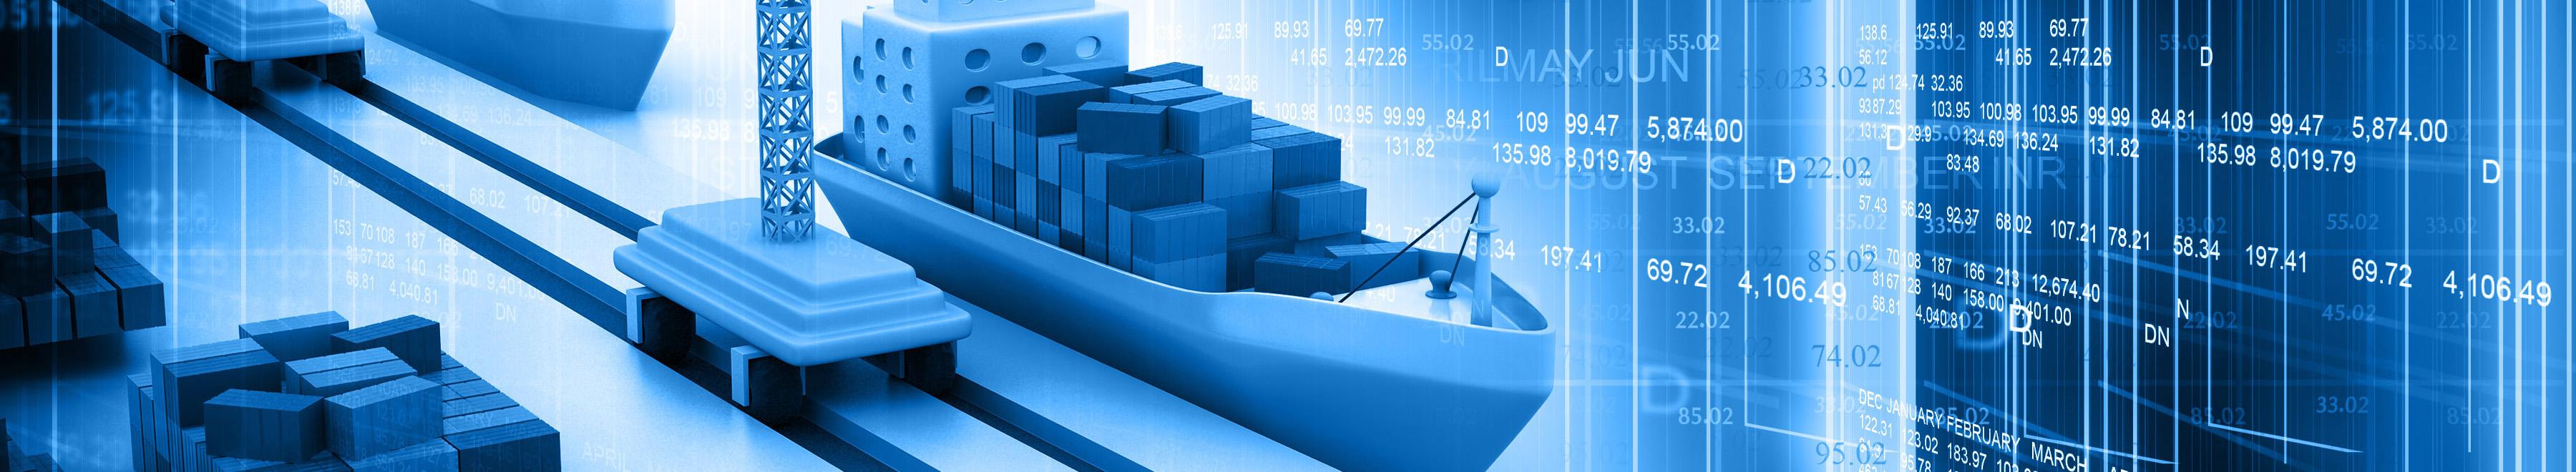 Pangea Network | Freight Forwarder Network